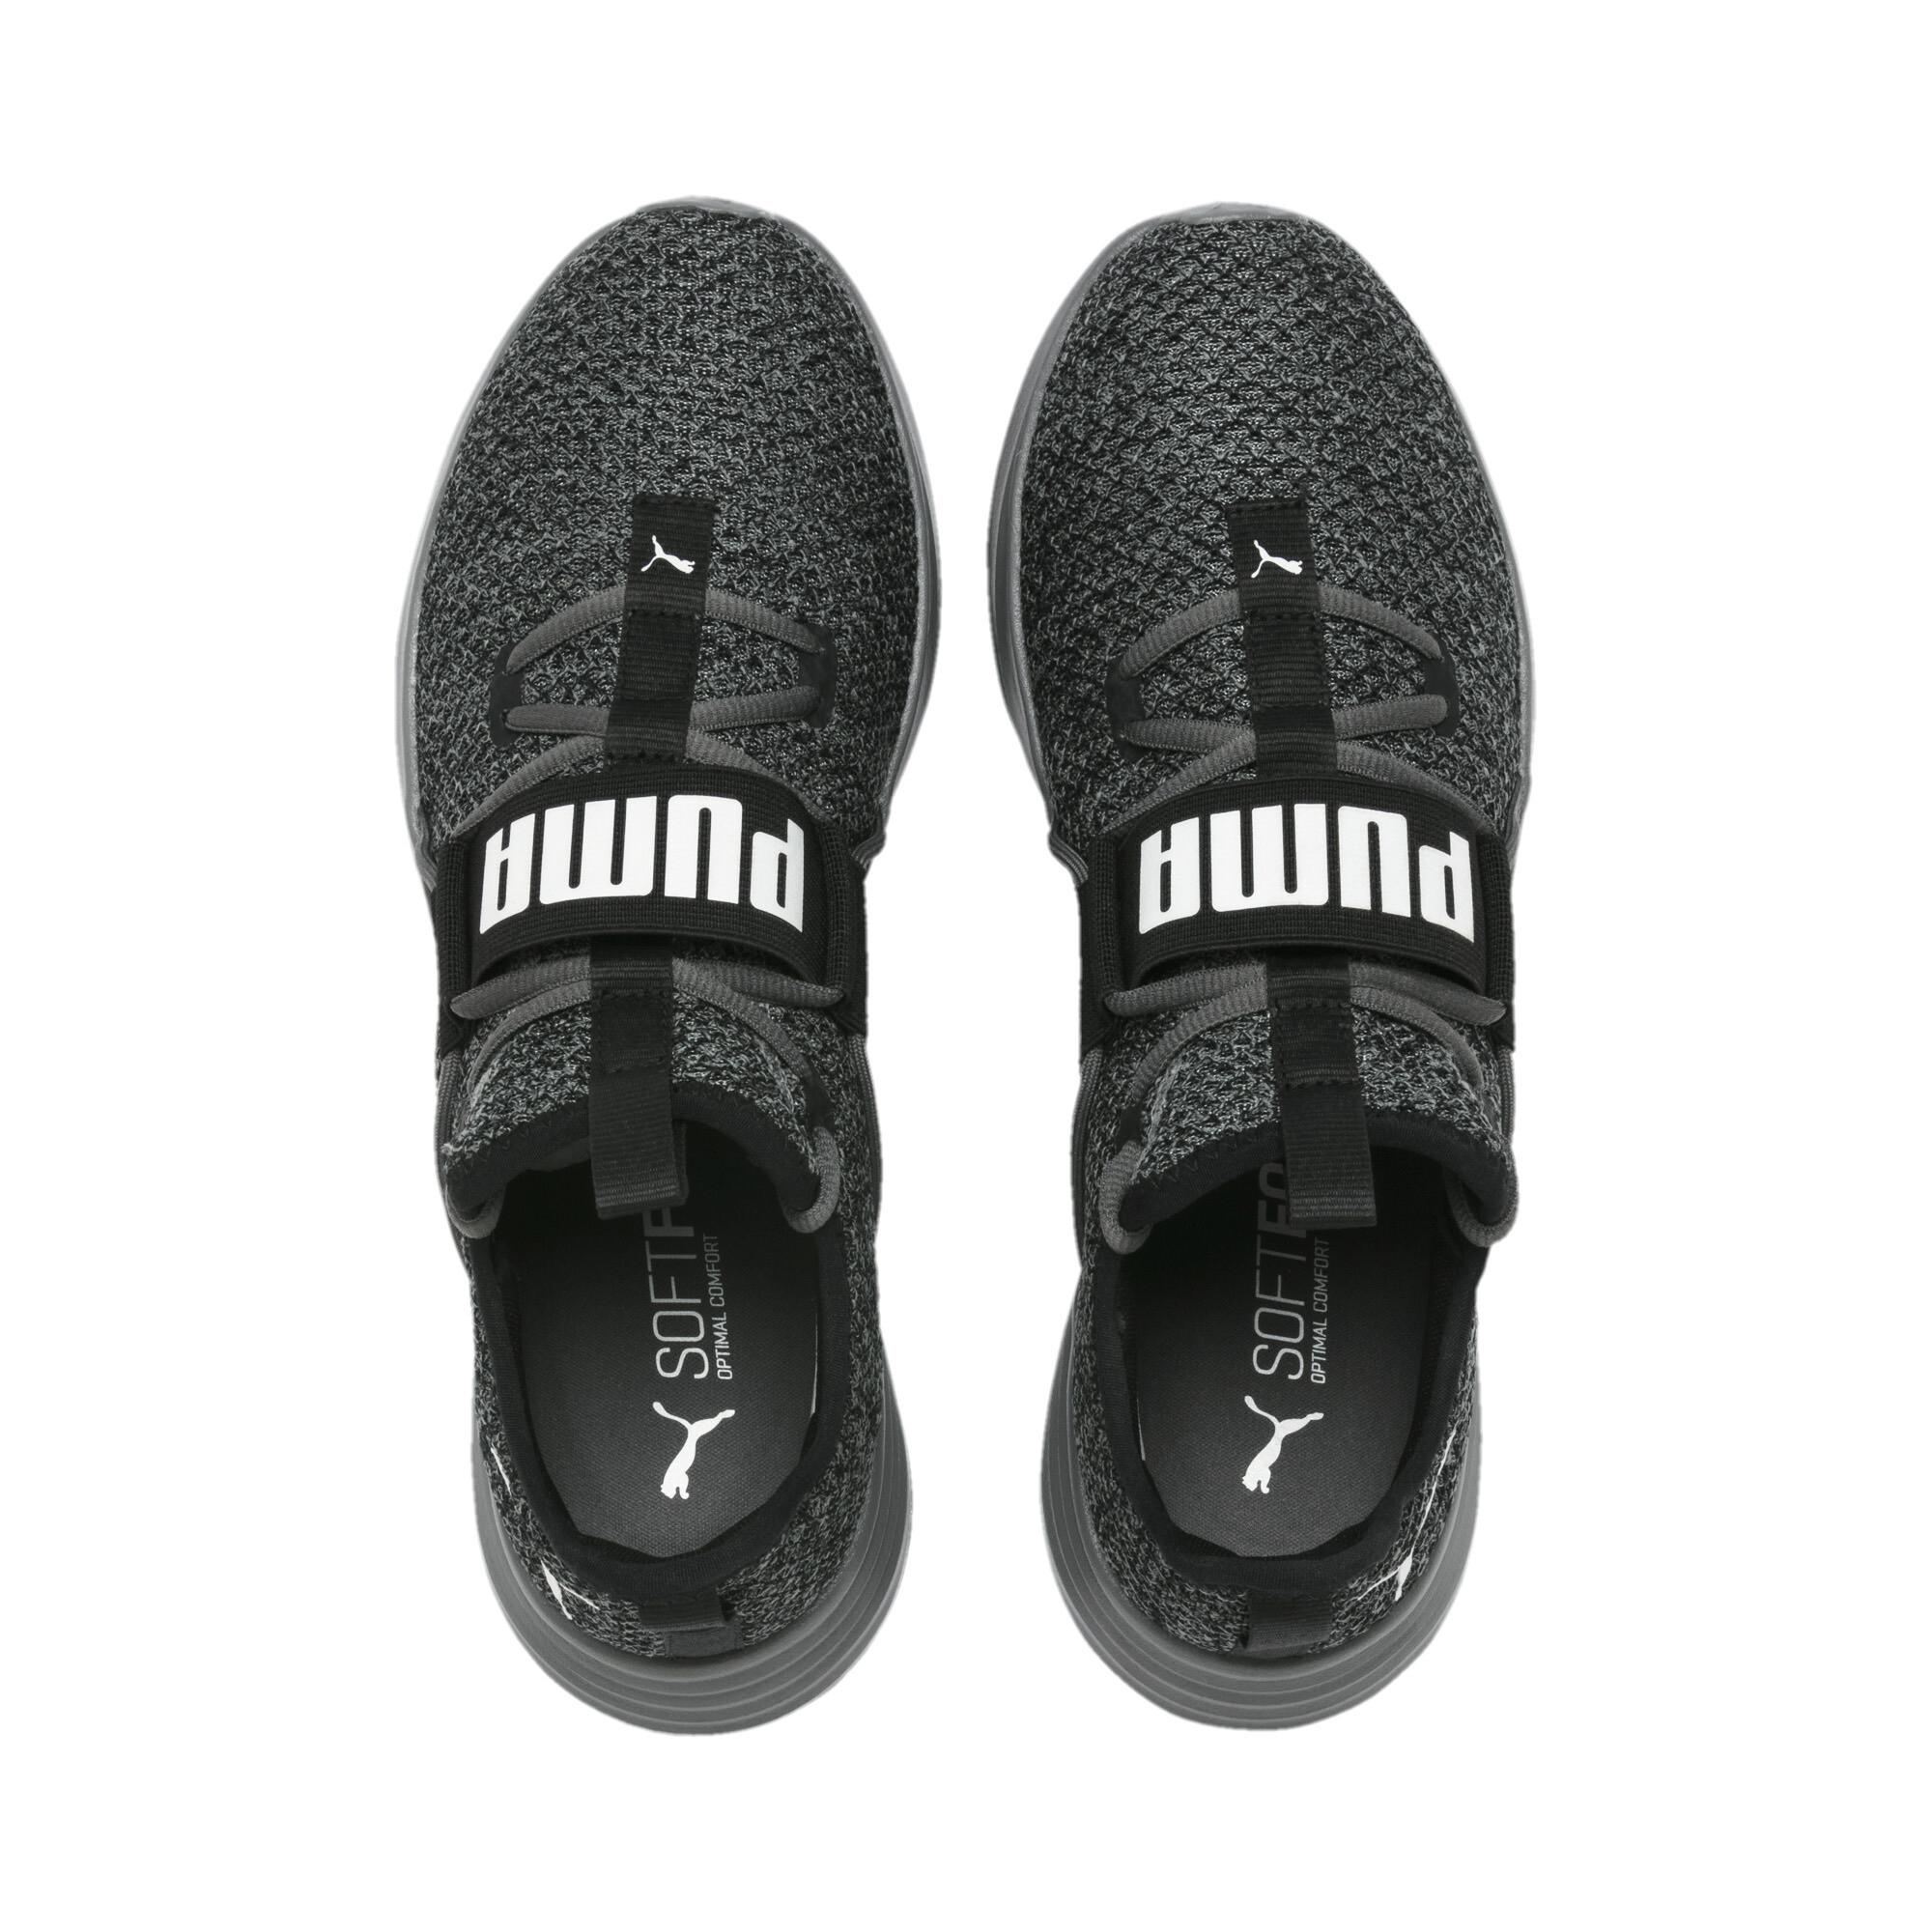 PUMA-Men-039-s-Persist-XT-Knit-Training-Shoes thumbnail 15